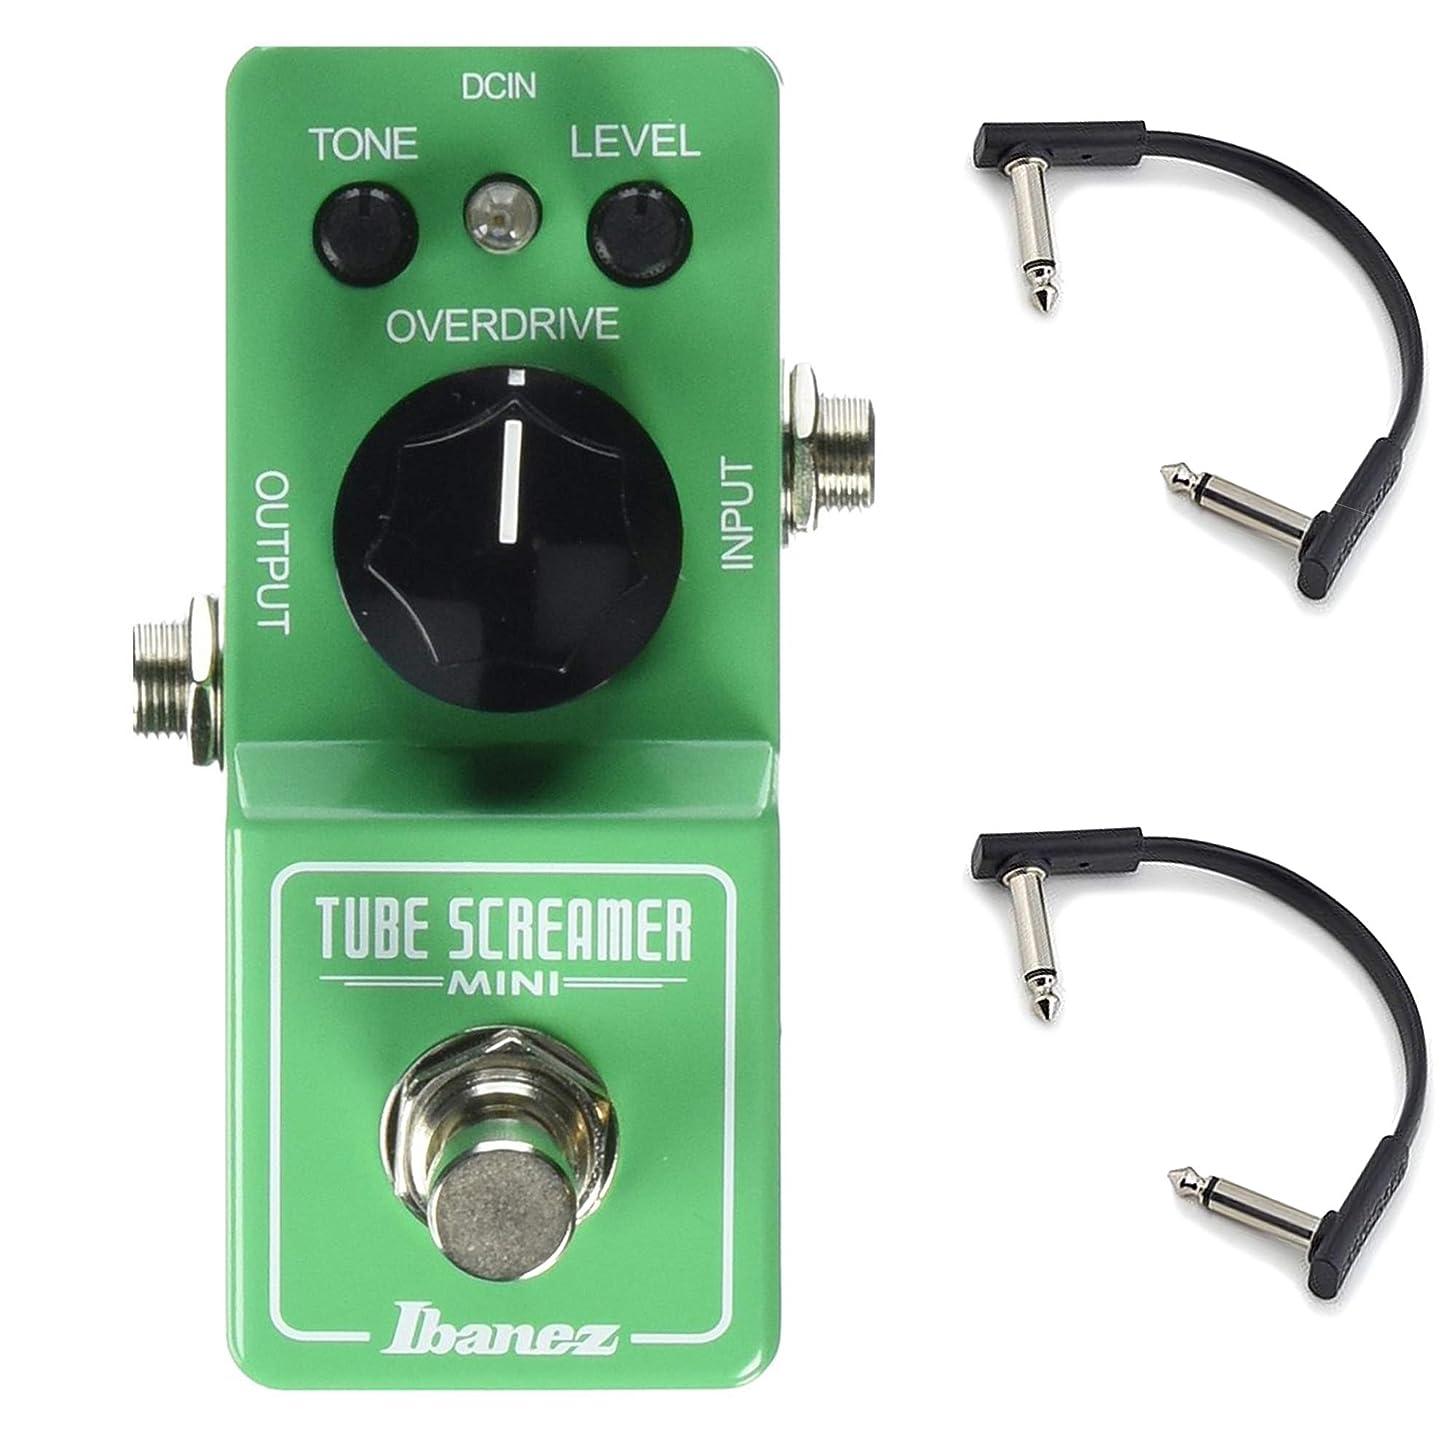 Ibanez Tube Screamer Mini w/RockBoard Flat Patch Cables Bundle